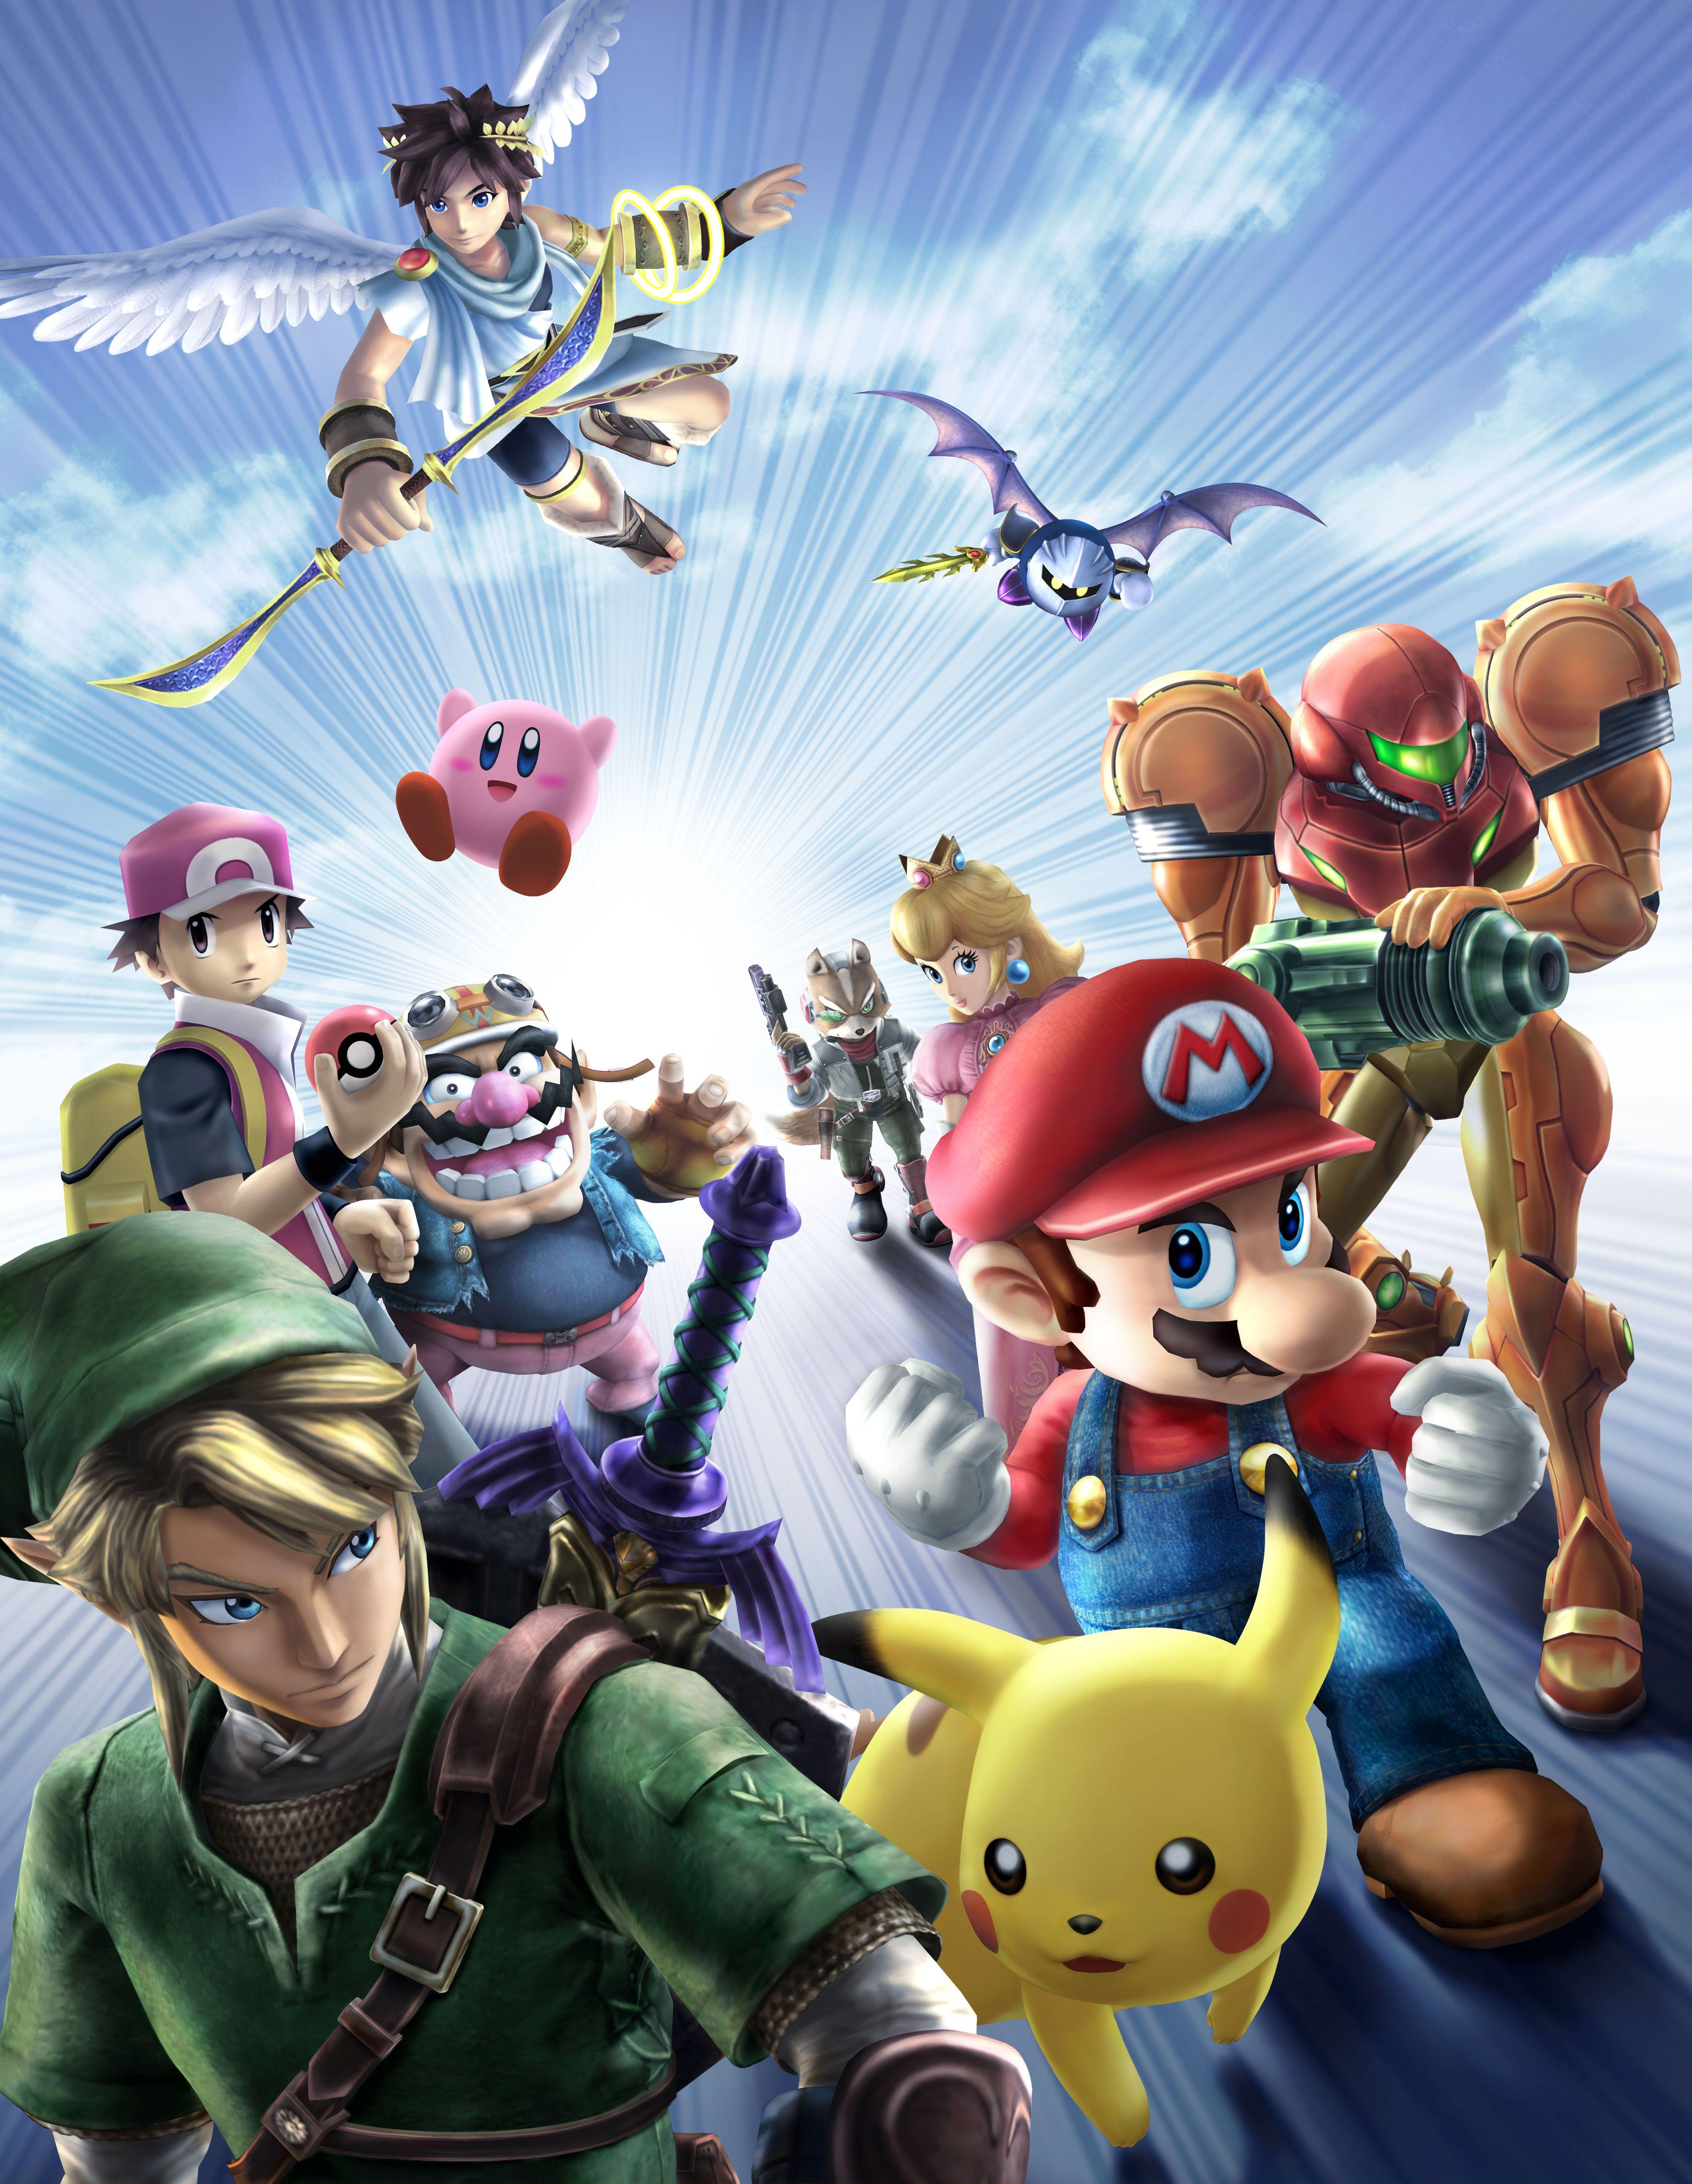 Super Smash Bros Brawl Poster Super Smash Bros Brawl Smash Bros Nintendo Super Smash Bros